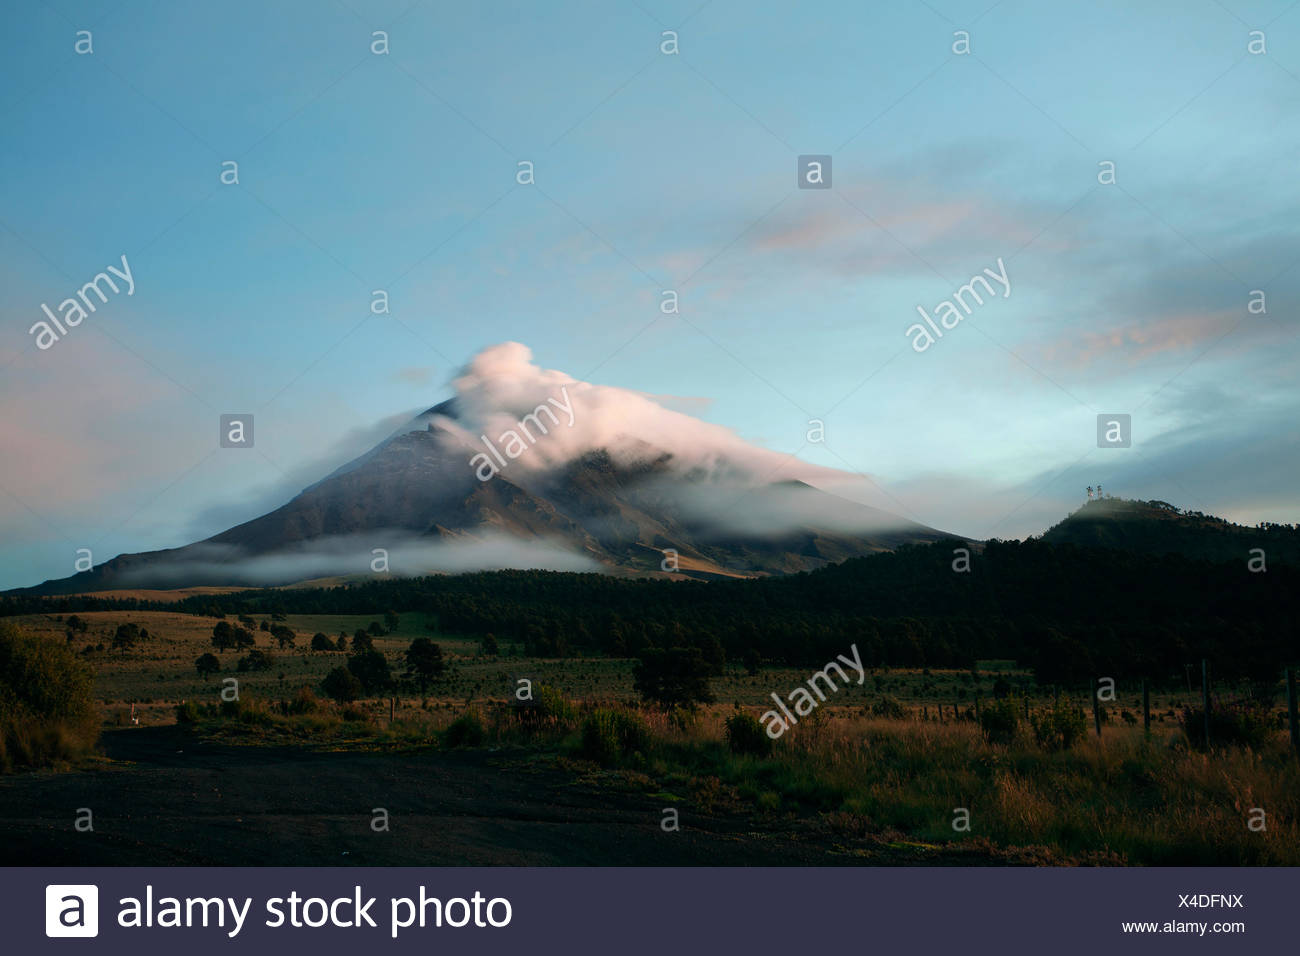 Popocatepetl volcanoe at sunrise. Estado de Mexico, Mexico Stock Photo